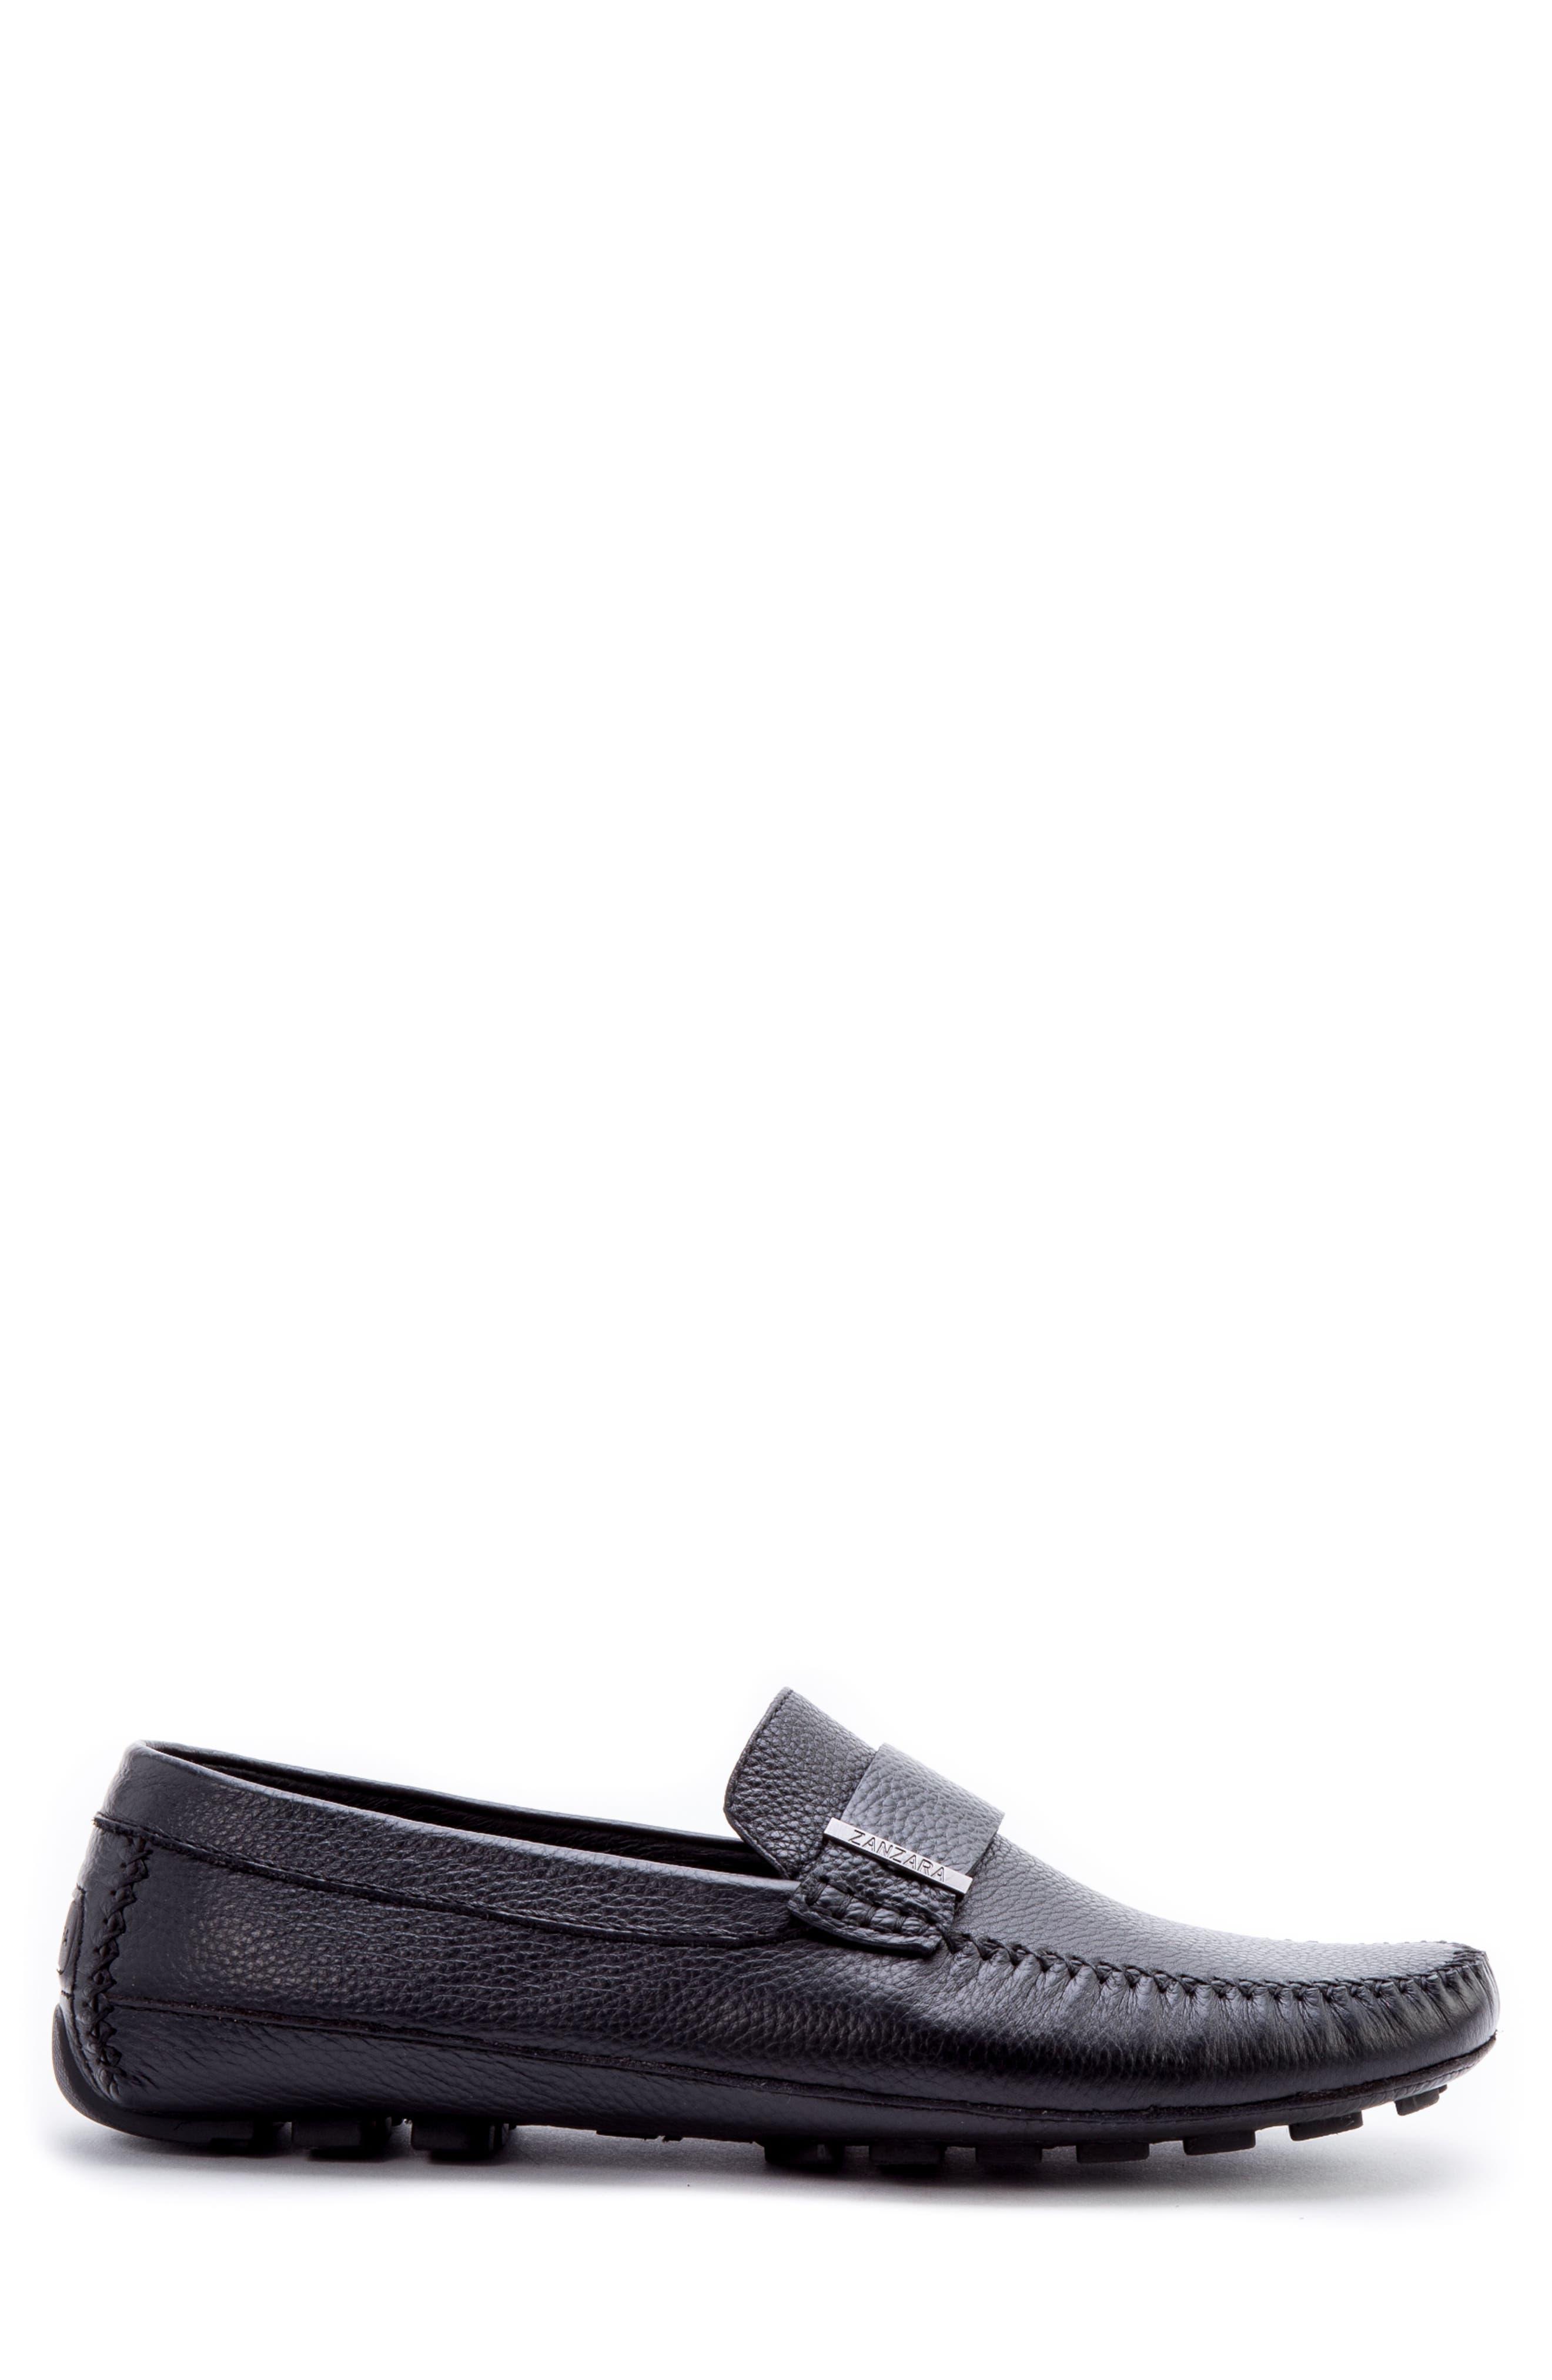 Kandinsky Moc Toe Driving Loafer,                             Alternate thumbnail 3, color,                             Black Leather